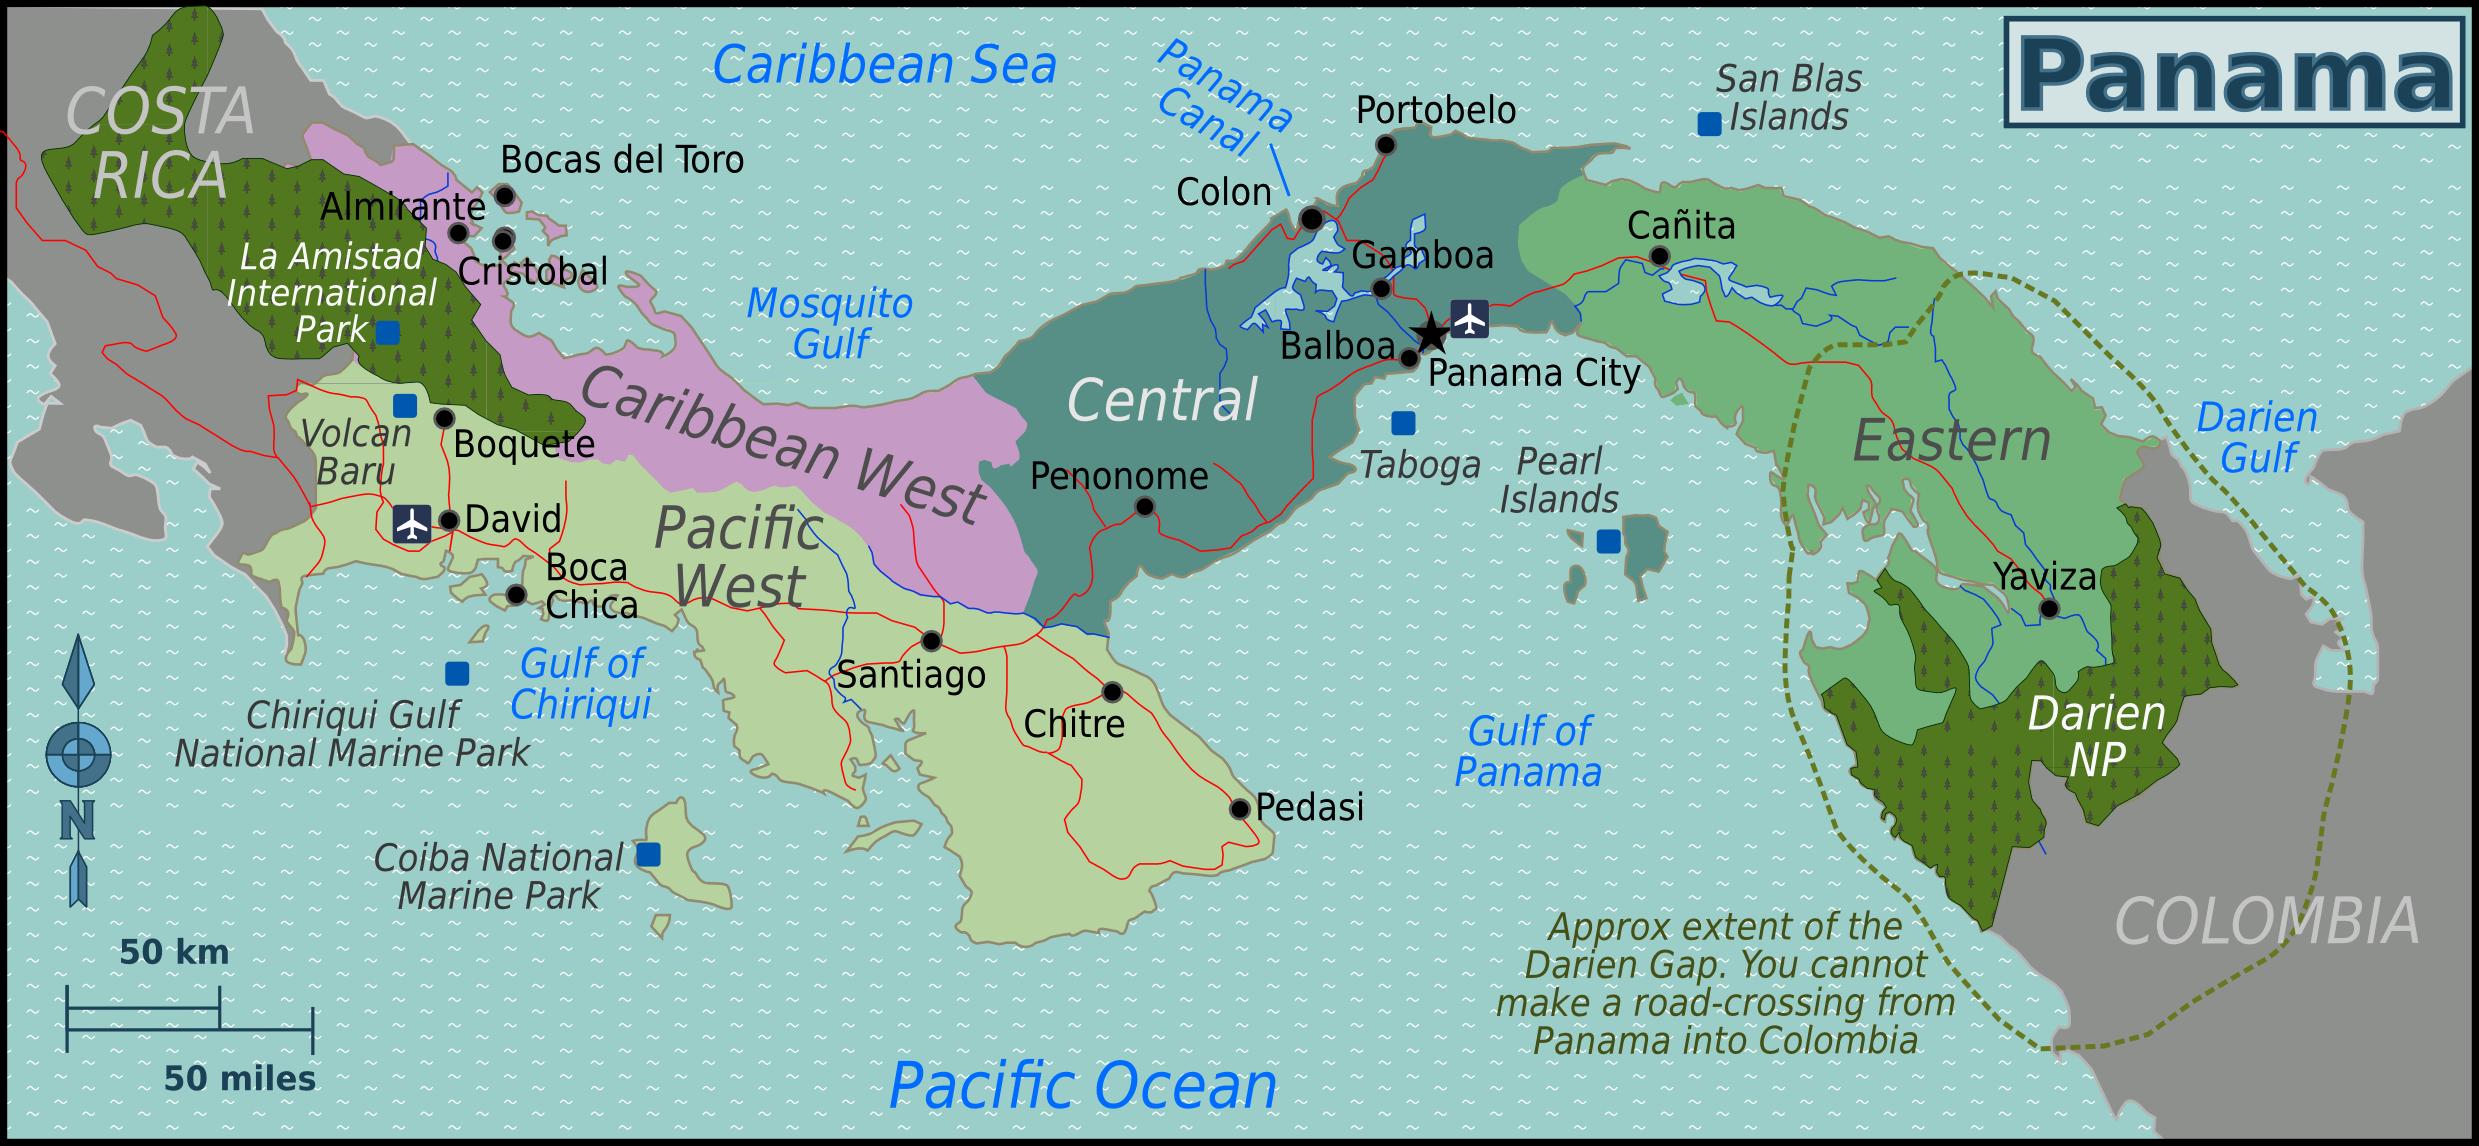 Panama_Regions_map.png